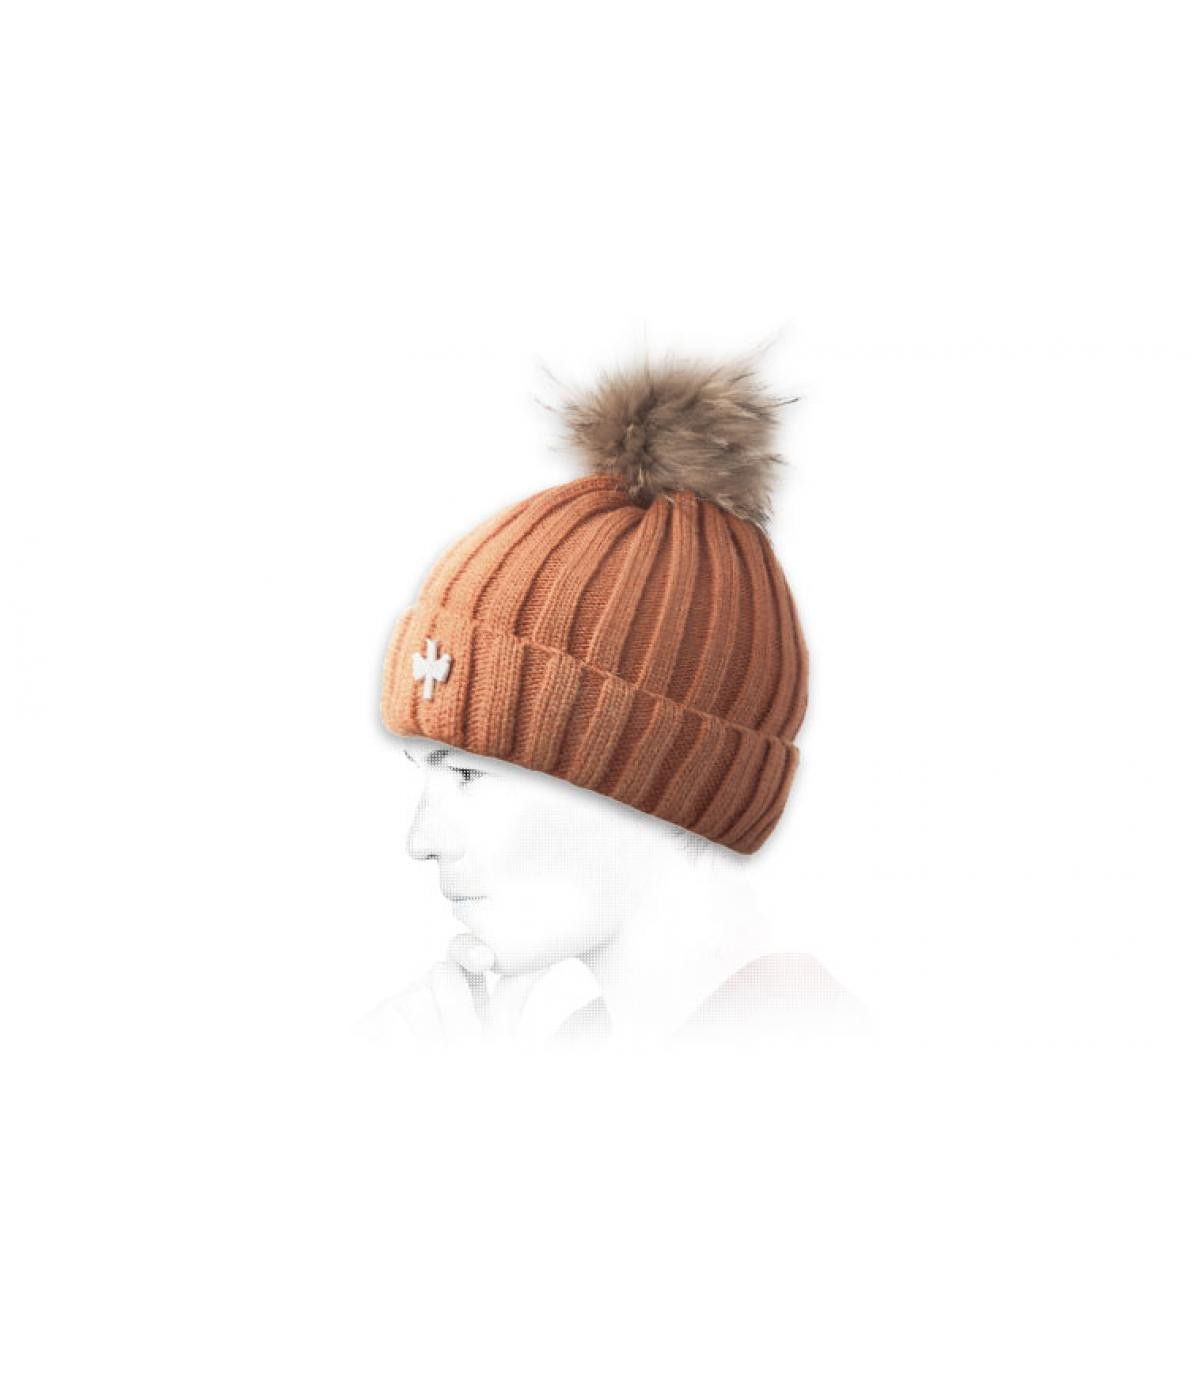 Rostfarbene Mütze mit buntem Bommel